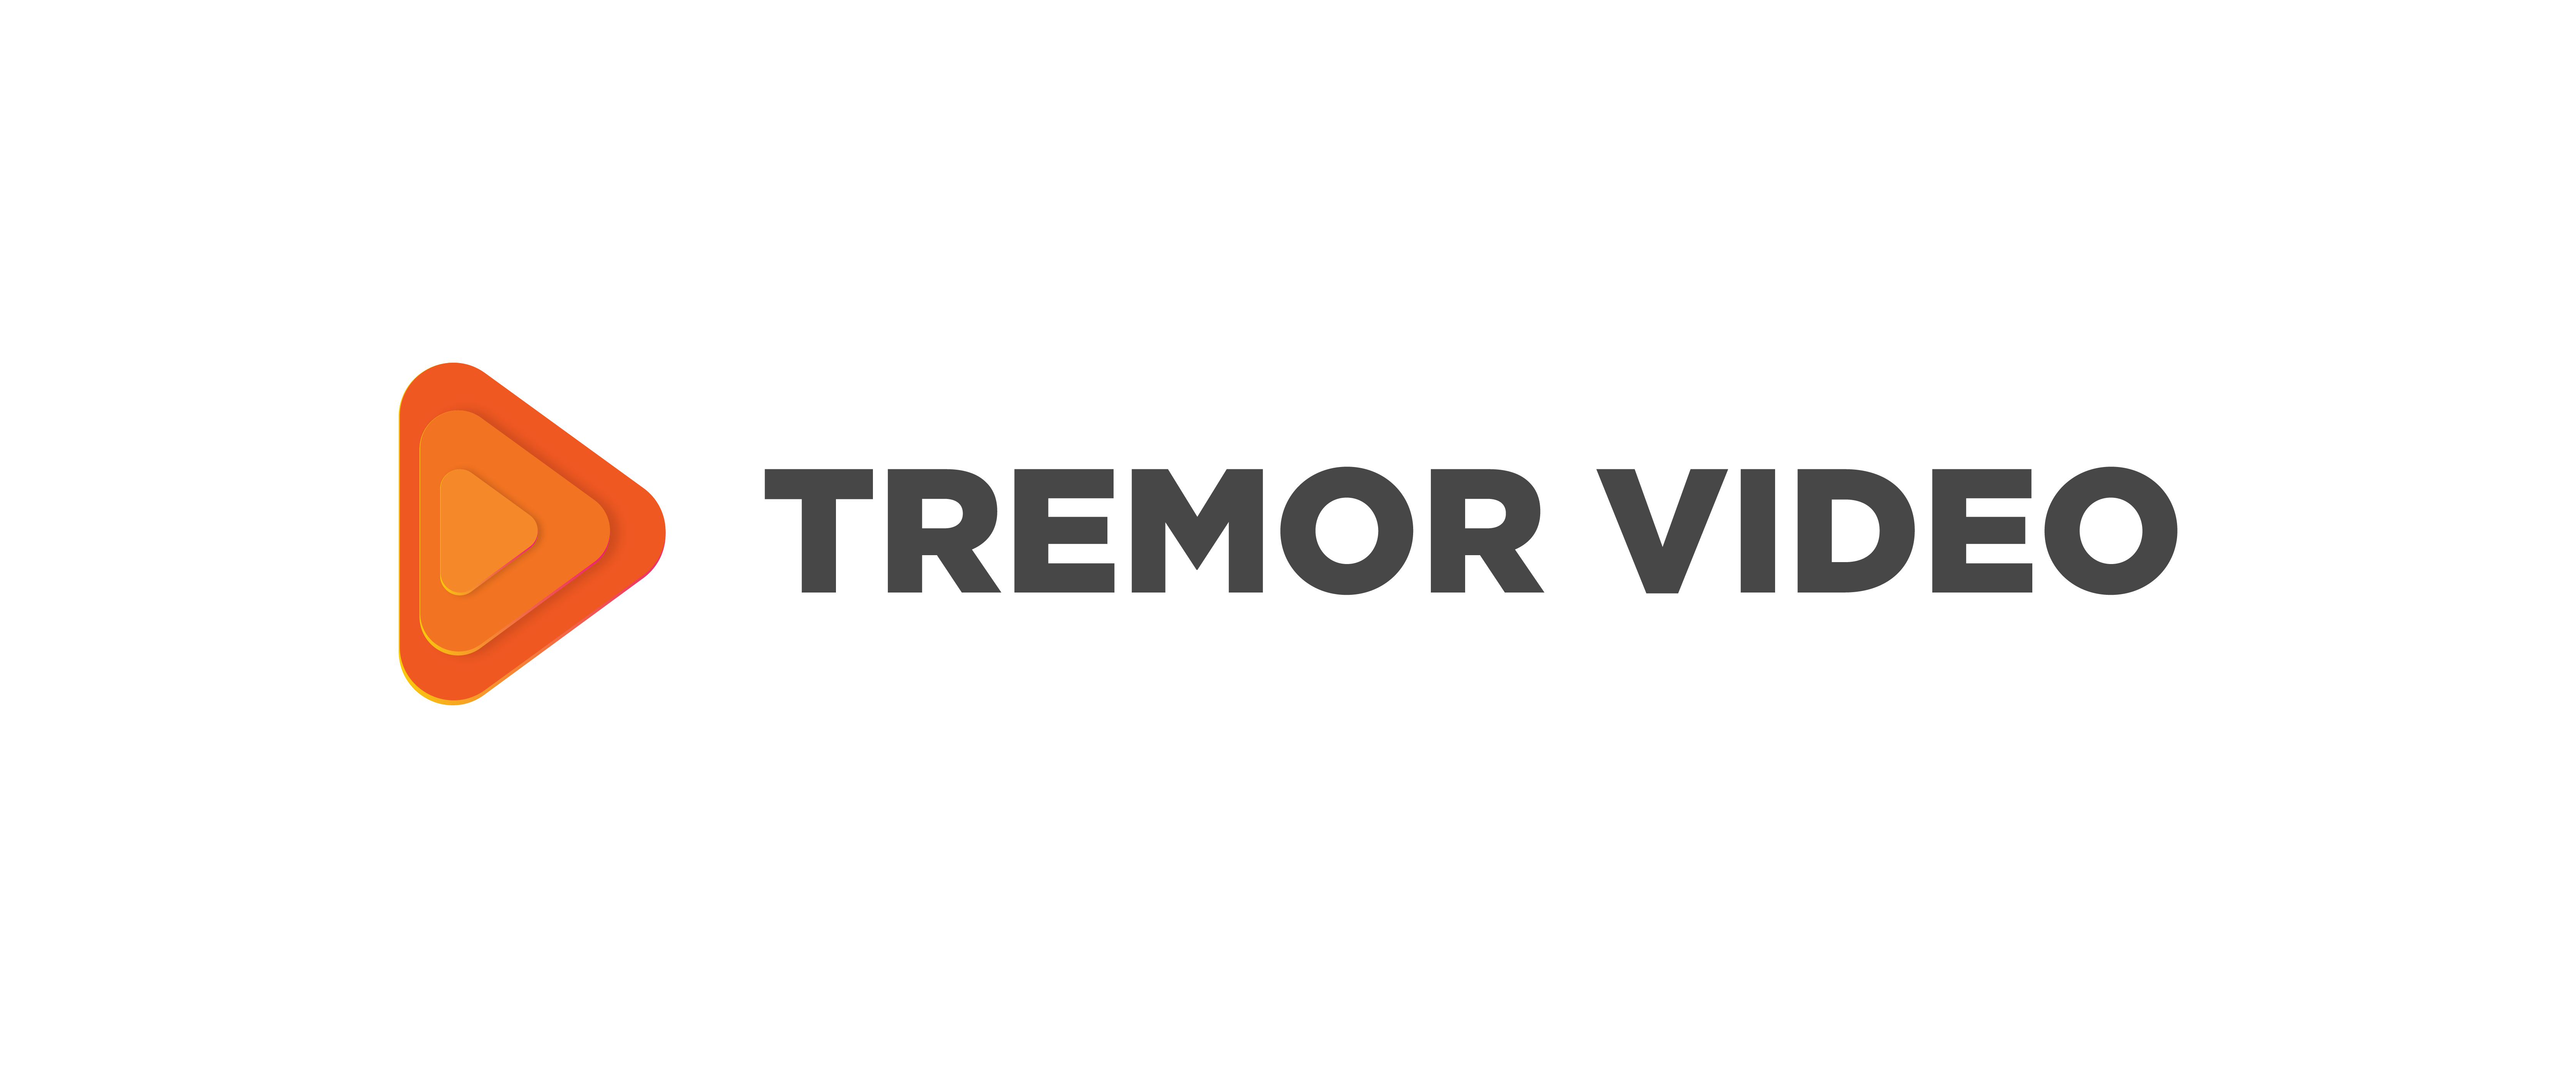 http://www.tremorvideodsp.com/intro